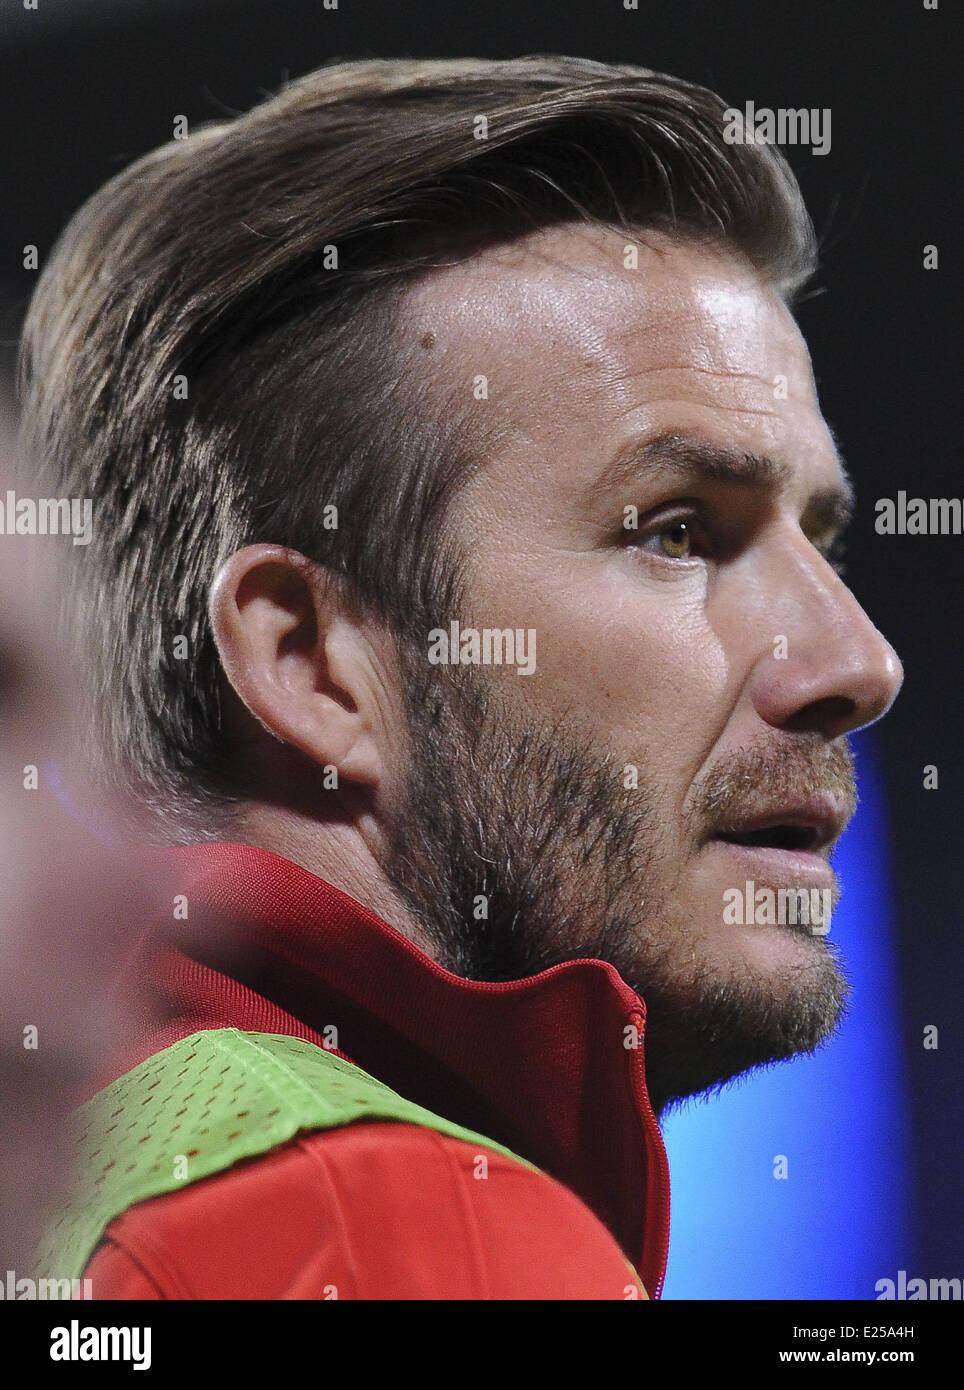 Paris Saint-Germain (PSG) vs. Olympique Lyonnais at Stade de Gerland  Featuring: David Beckham Where: Lyon, France Stock Photo